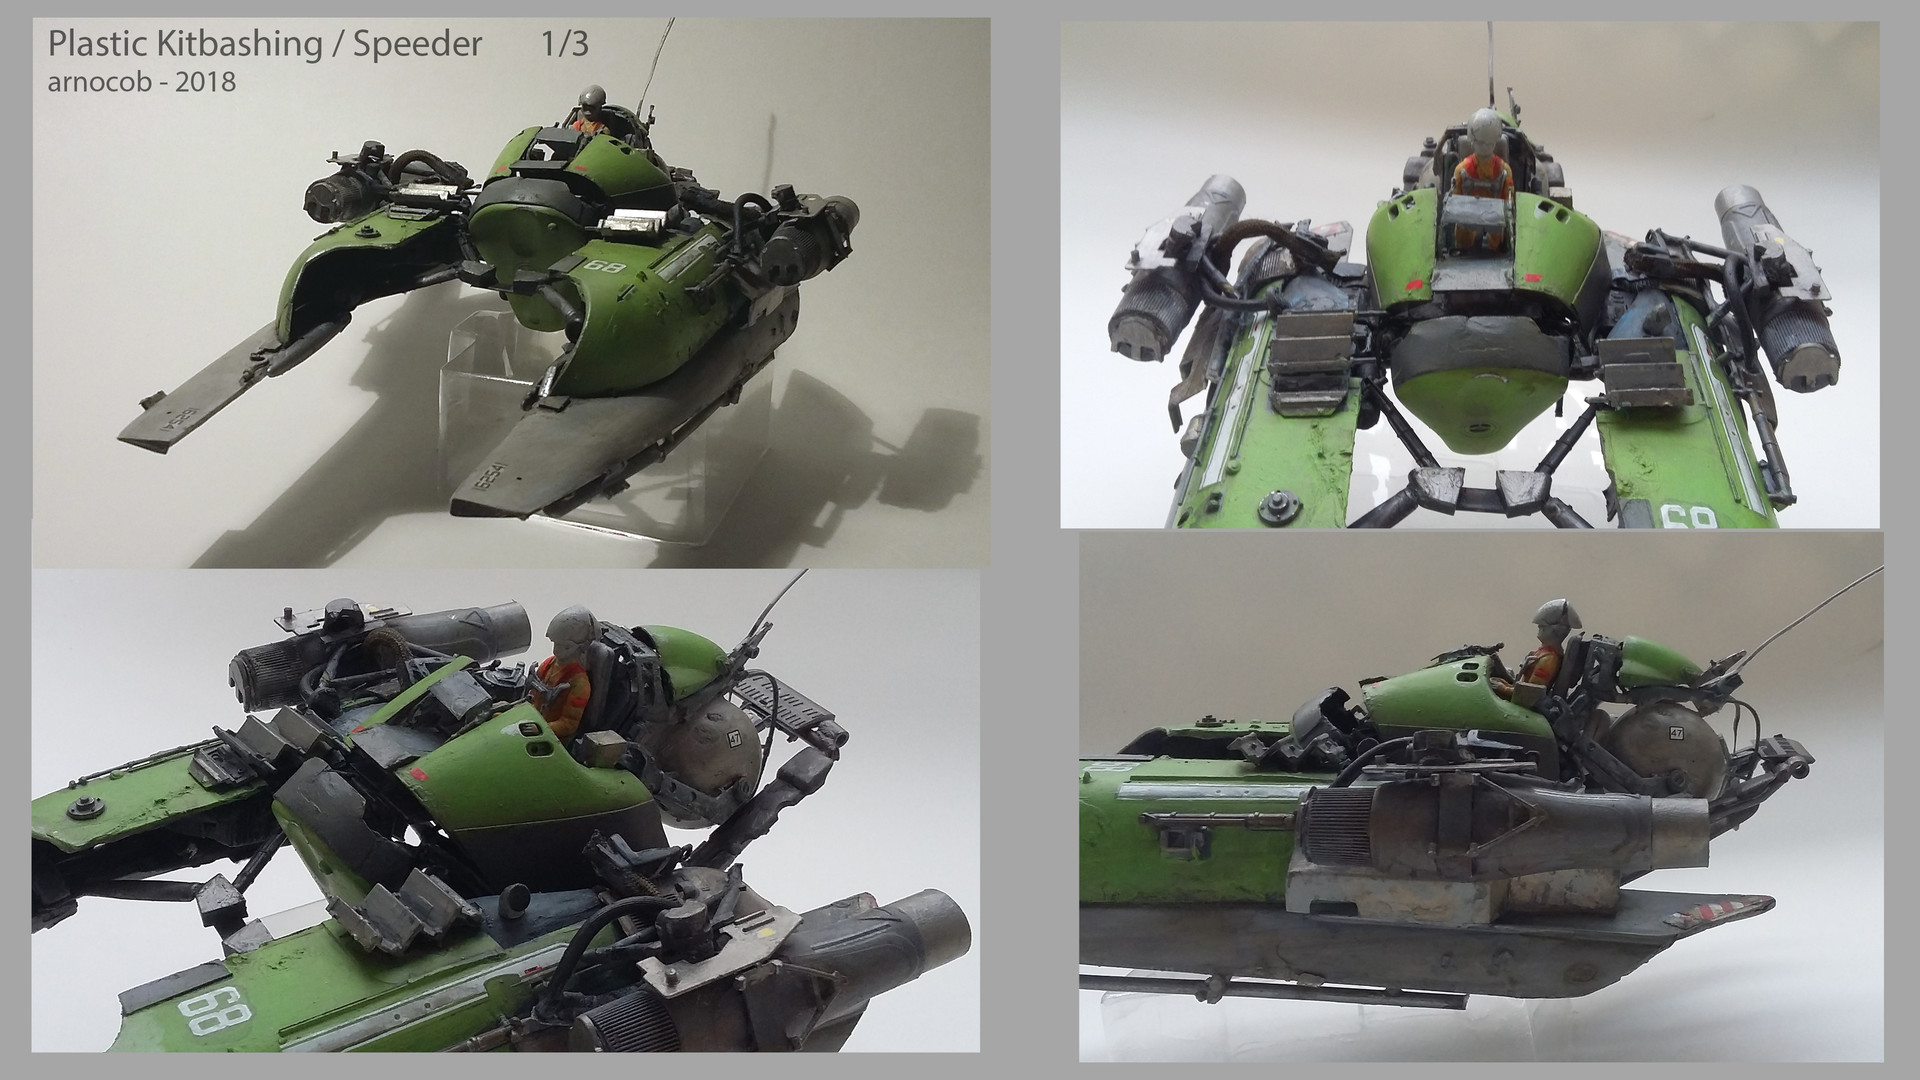 Arnaud caubel plastickitbashing speeder arnocob 01